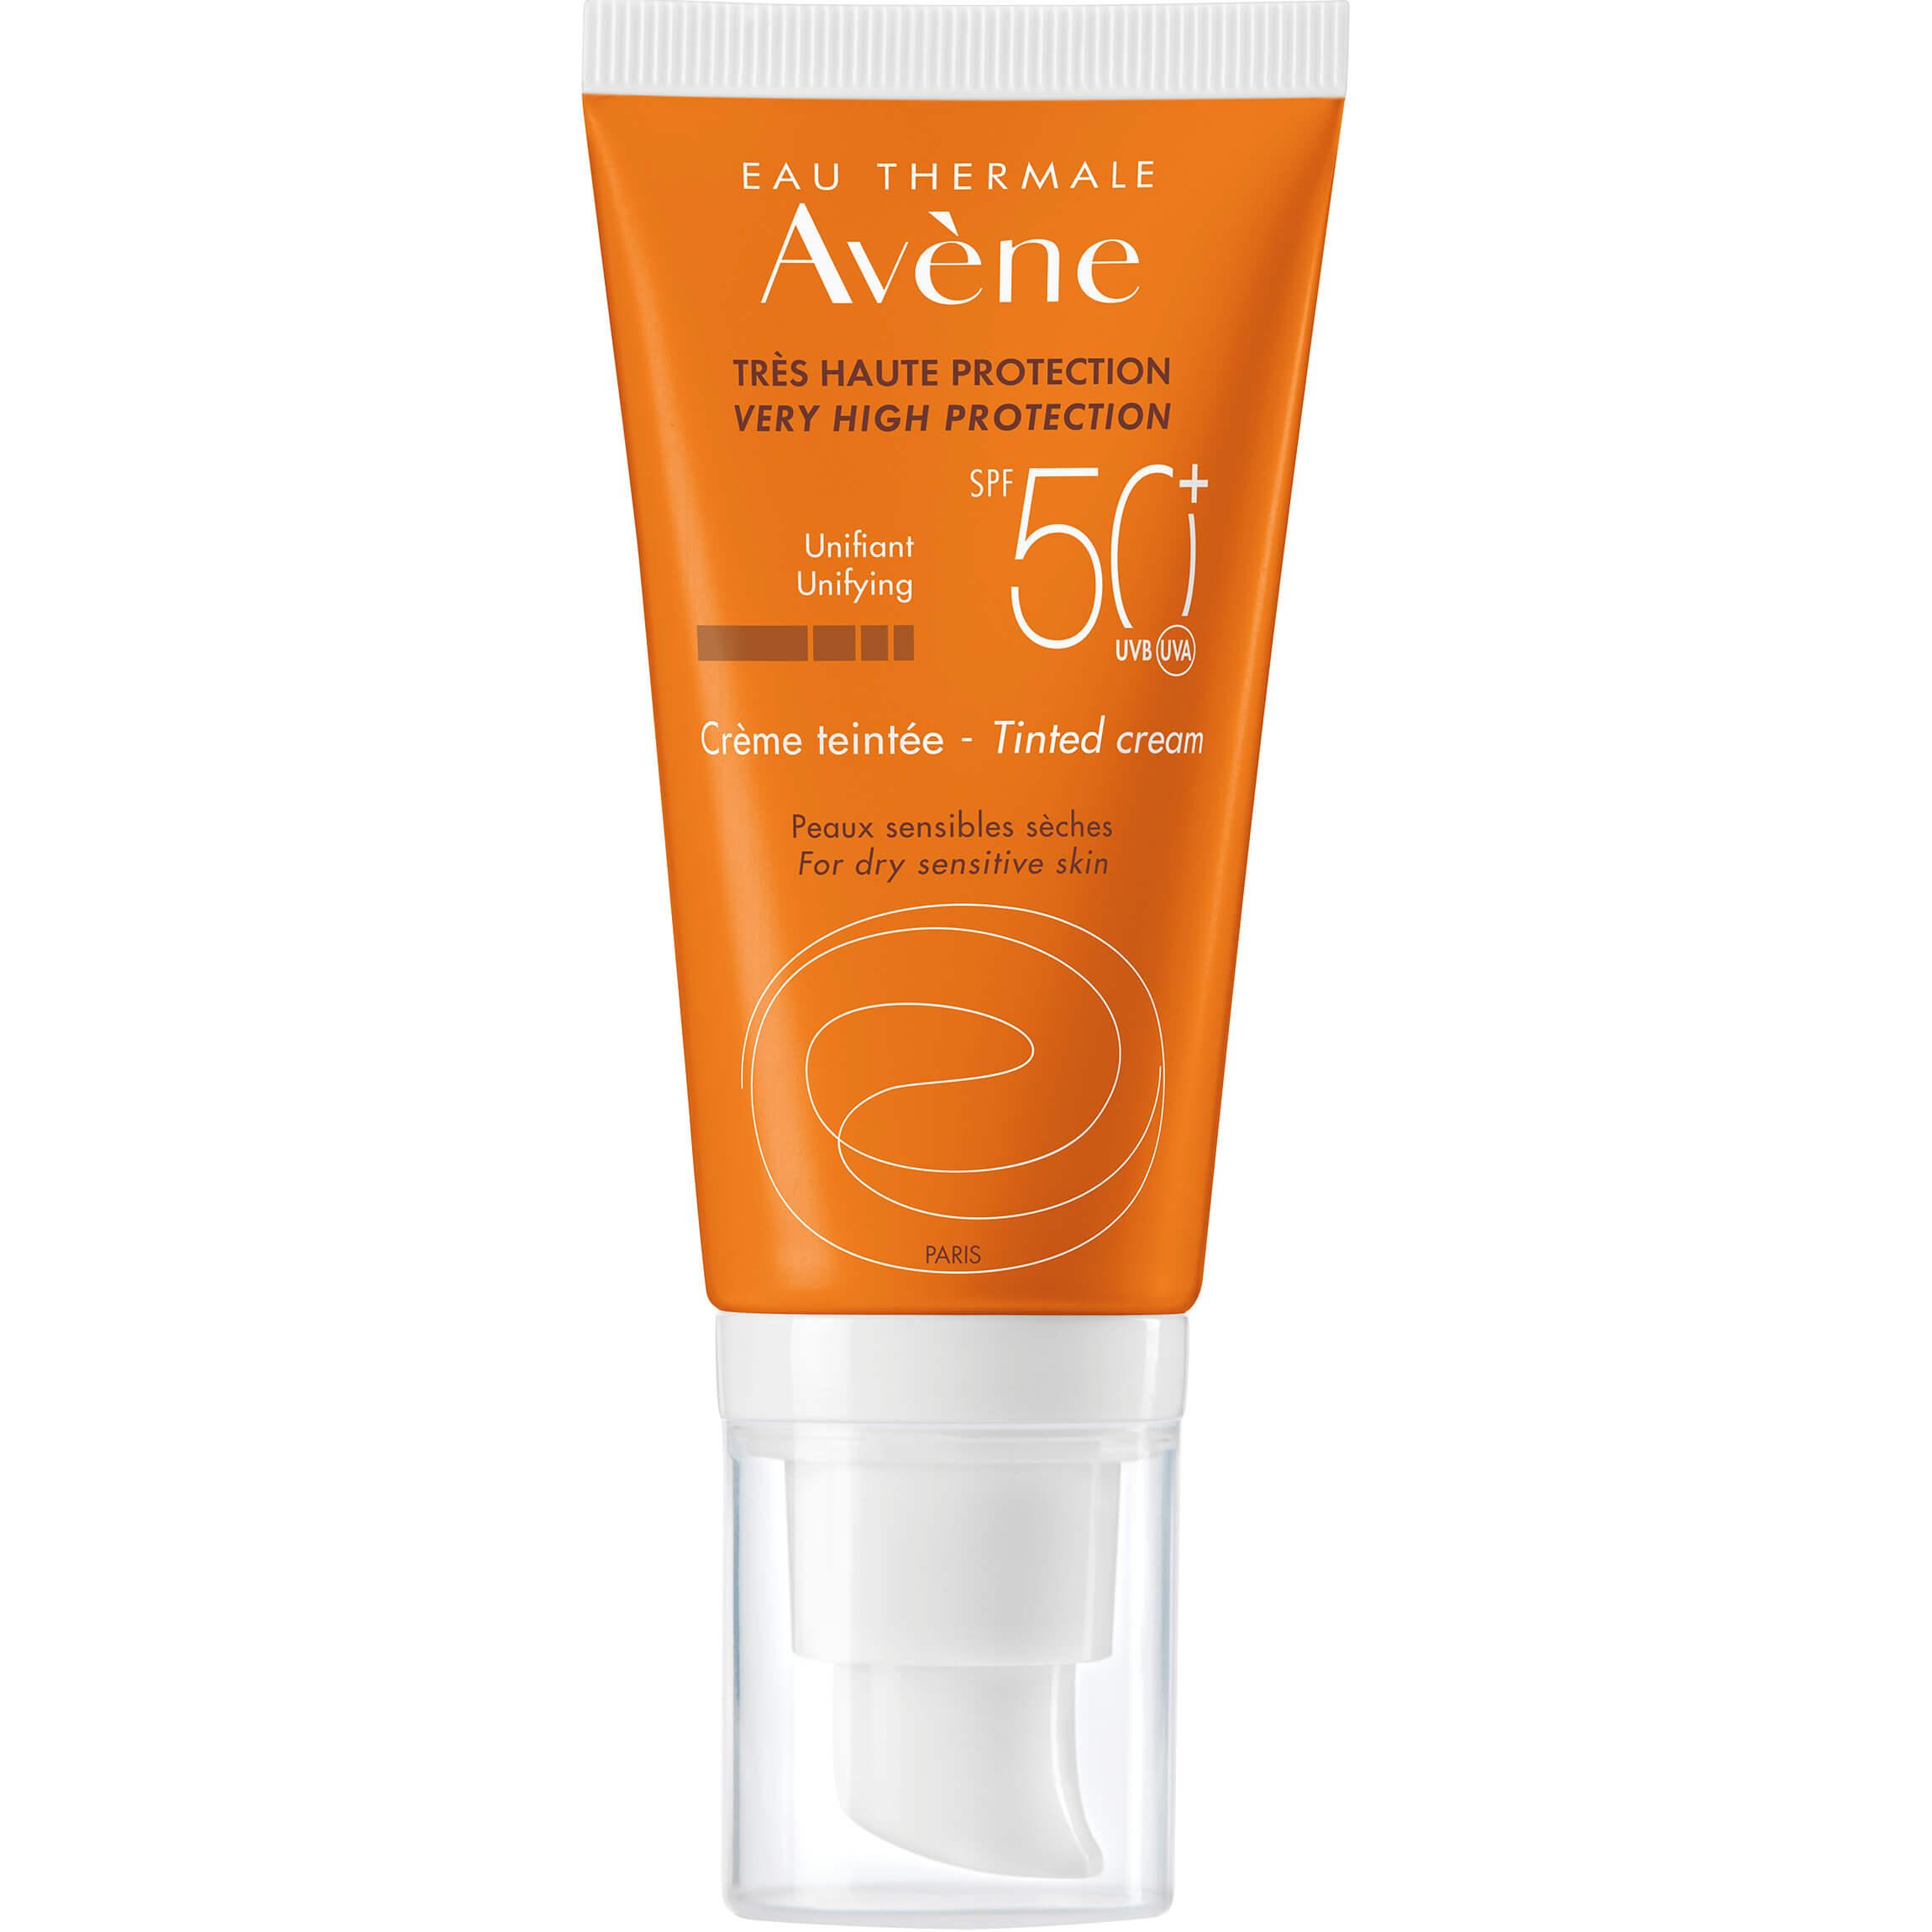 Avene Creme Tinted Cream Spf50+ Αντηλιακή Κρέμα Προσώπου Πολύ Υψηλής Προστασίας με Χρώμαγια Ξηρή – Ευαίσθητη Επιδερμίδα50ml